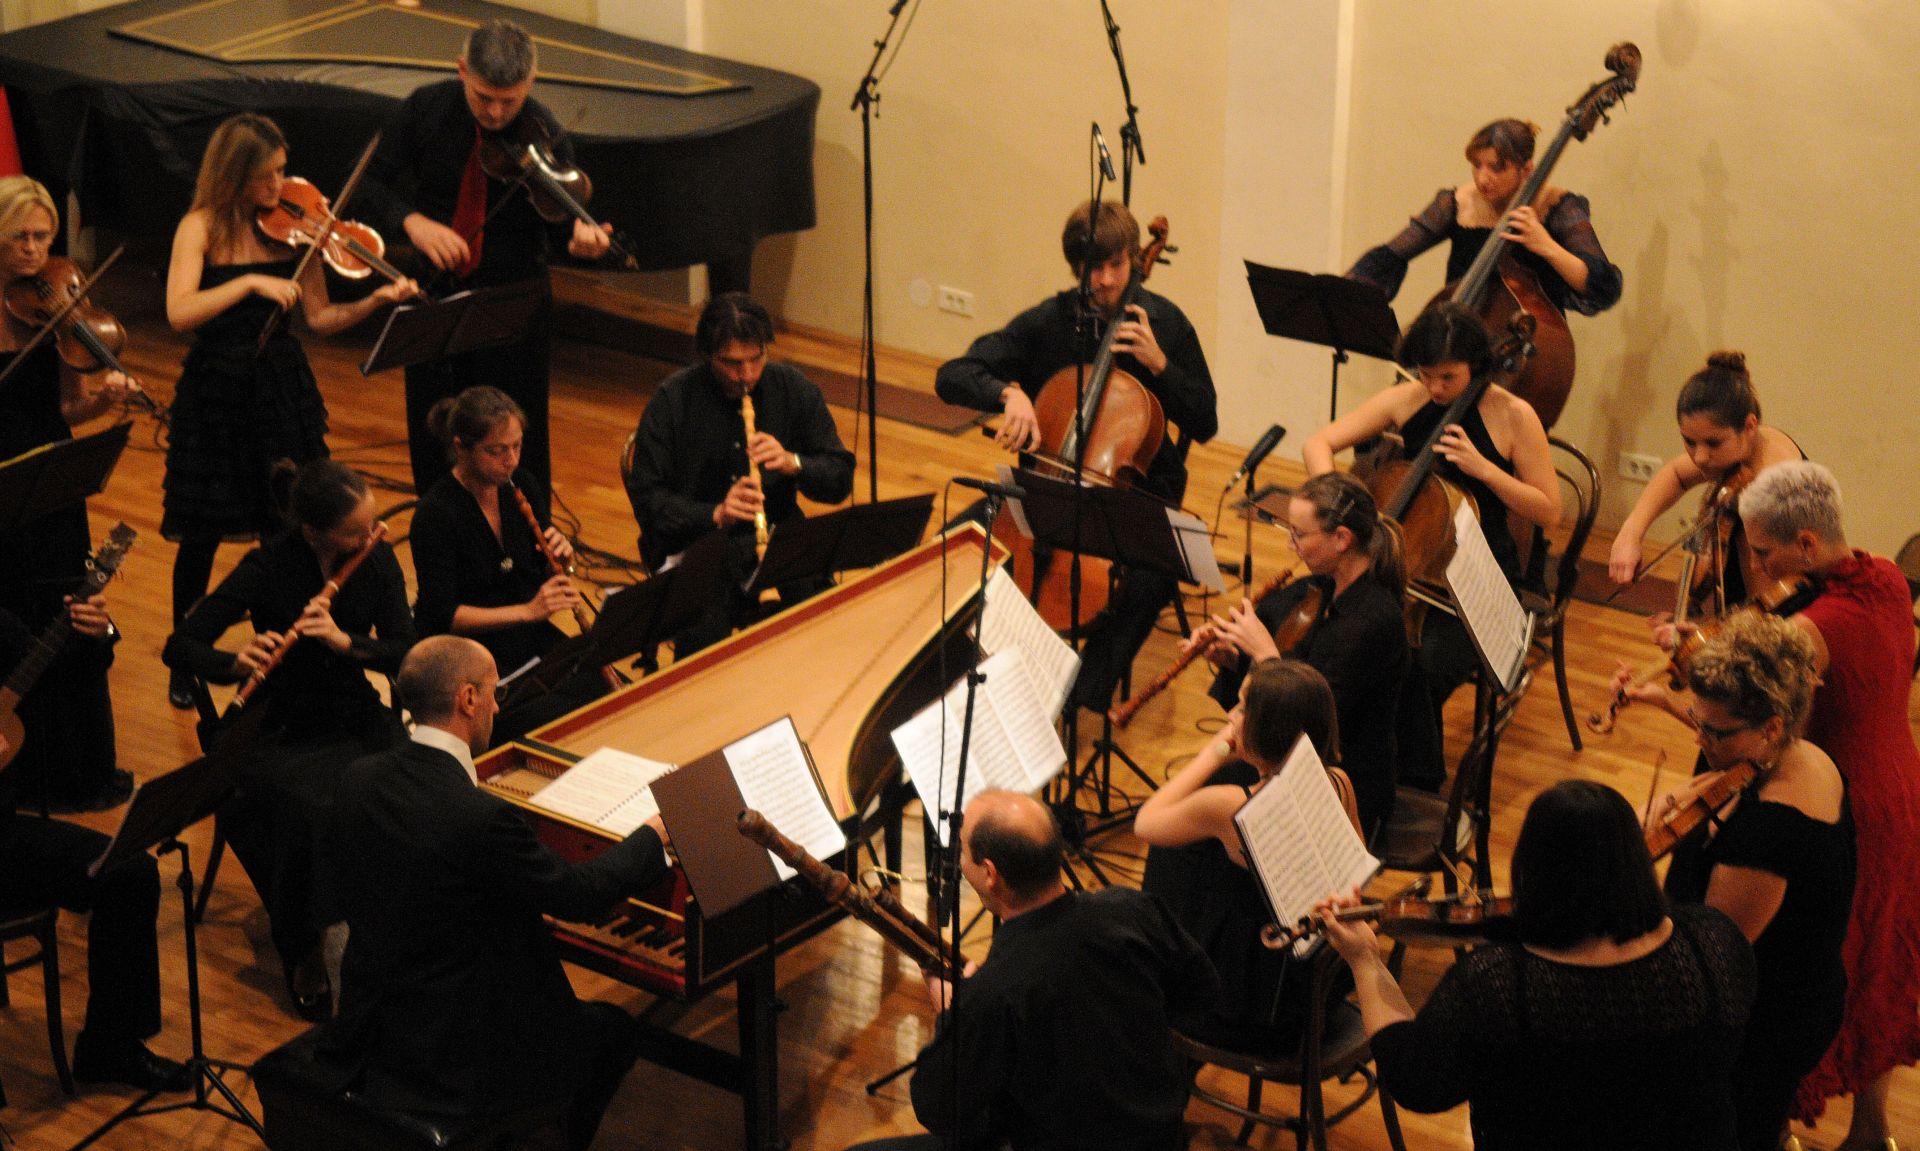 Svečanim koncertom Hrvatski komorni orkestar slavi 25. rođendan